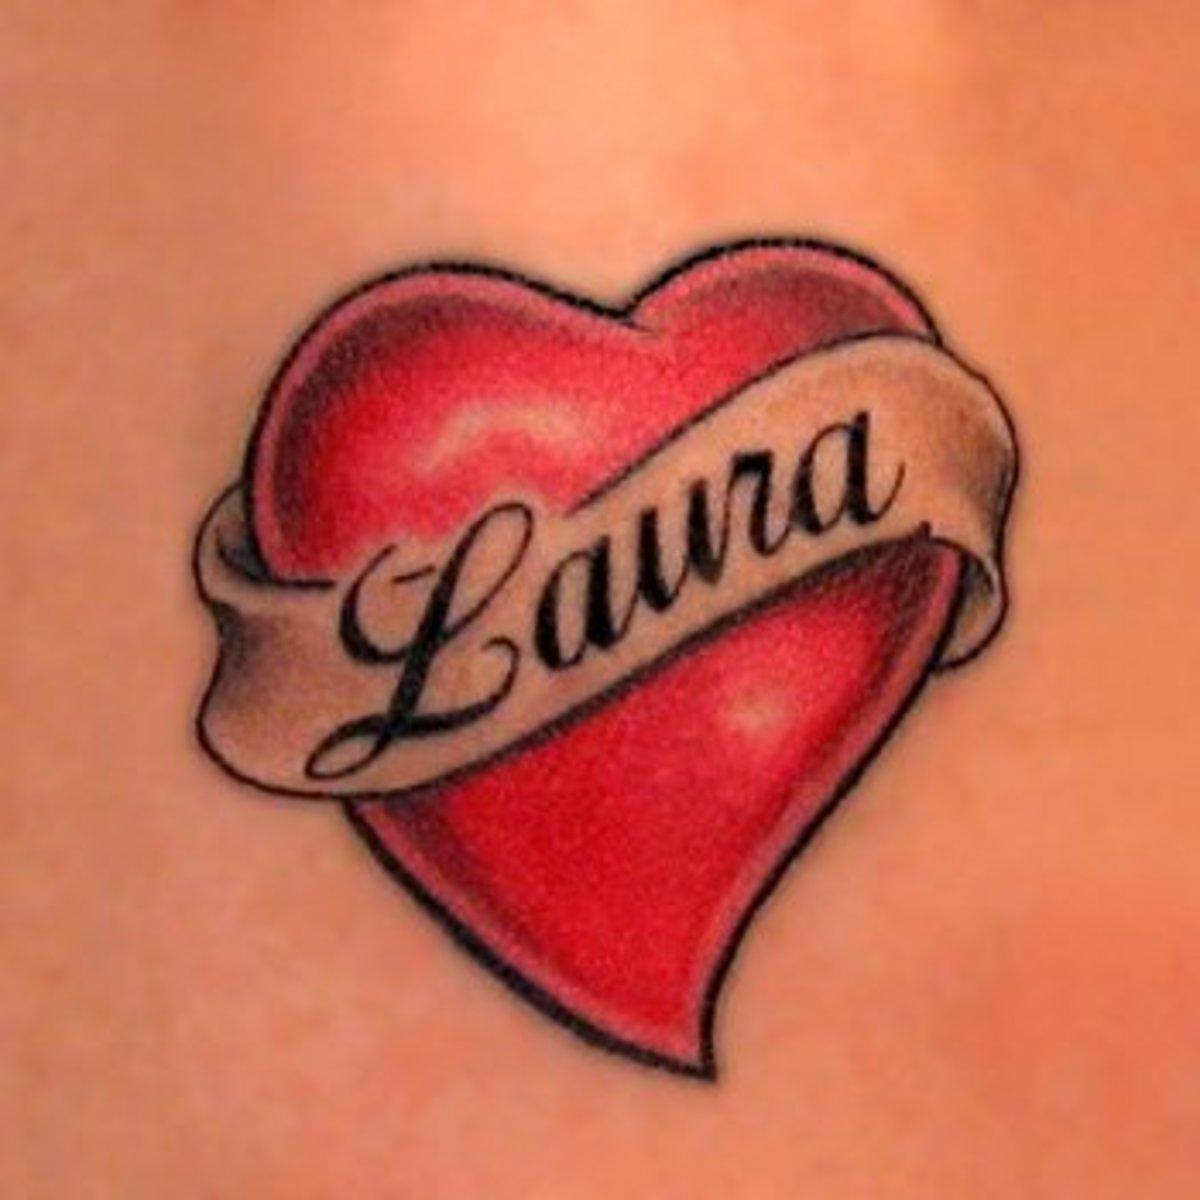 Heart Tattoo design